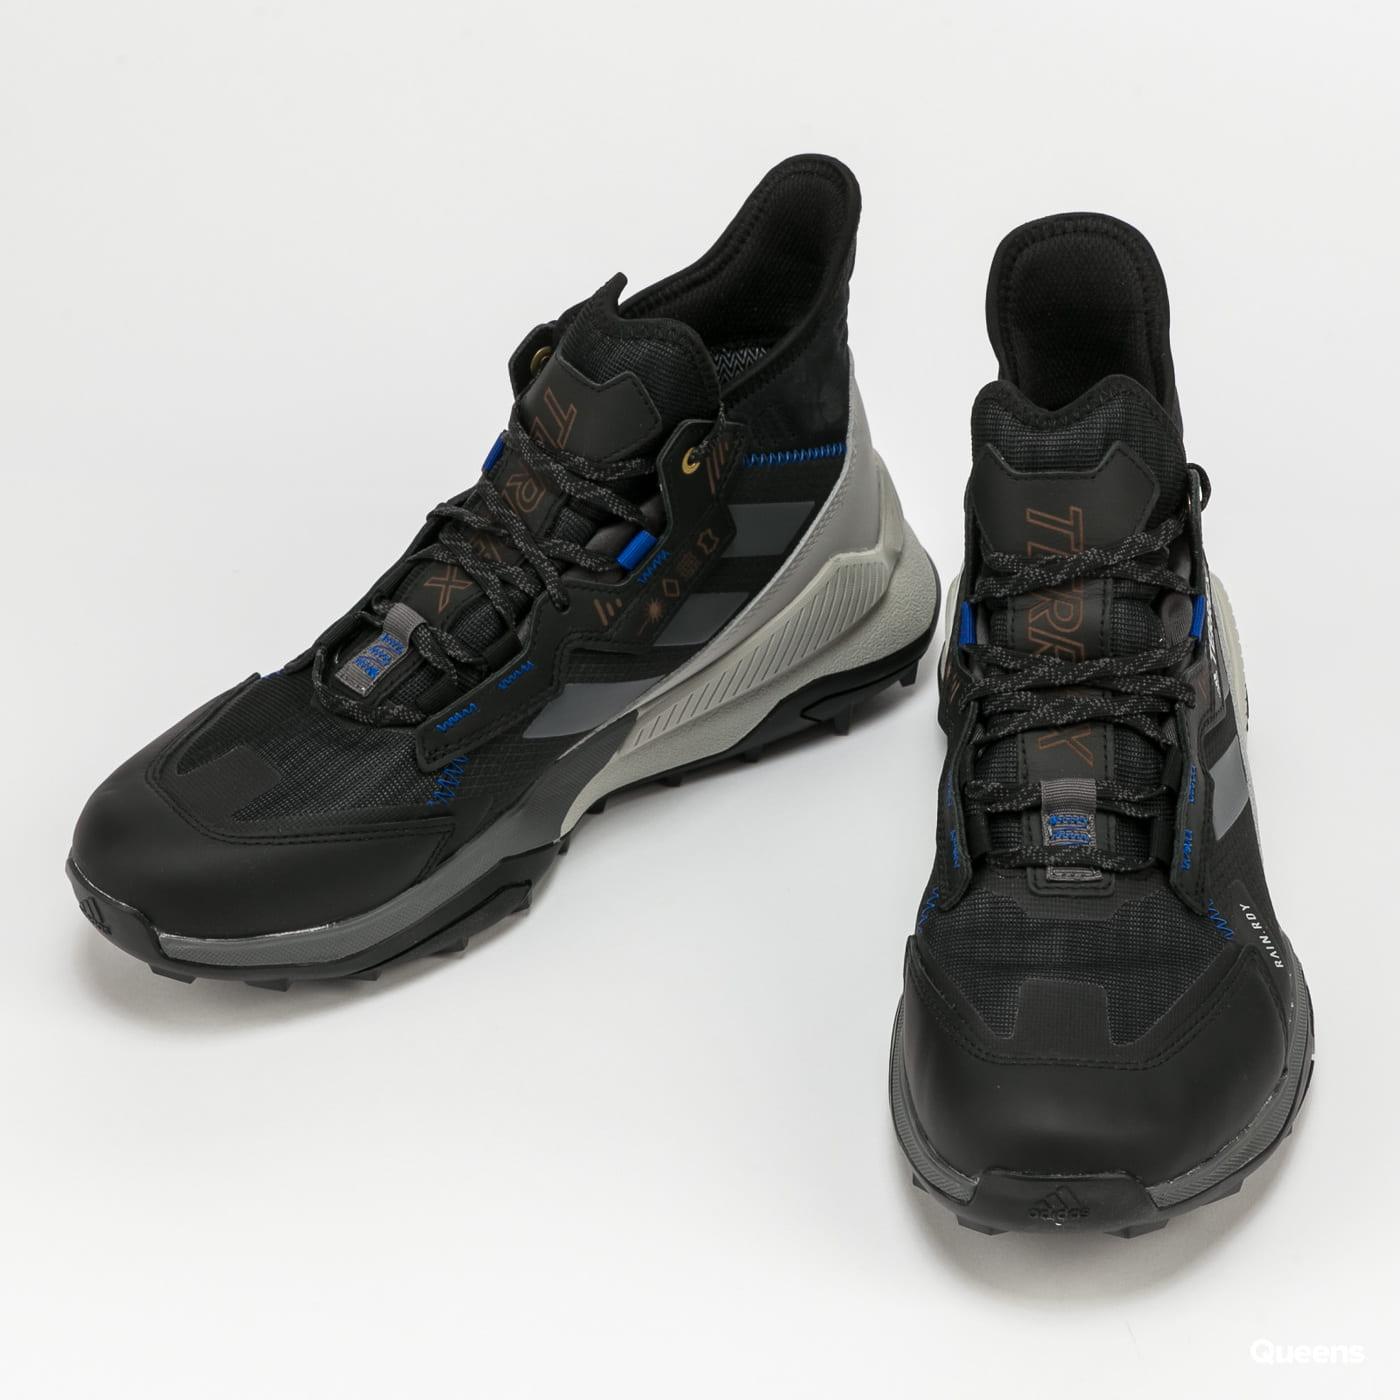 adidas Performance Terrex Hyperblue Mid R.RDY core black / grey two / grey five